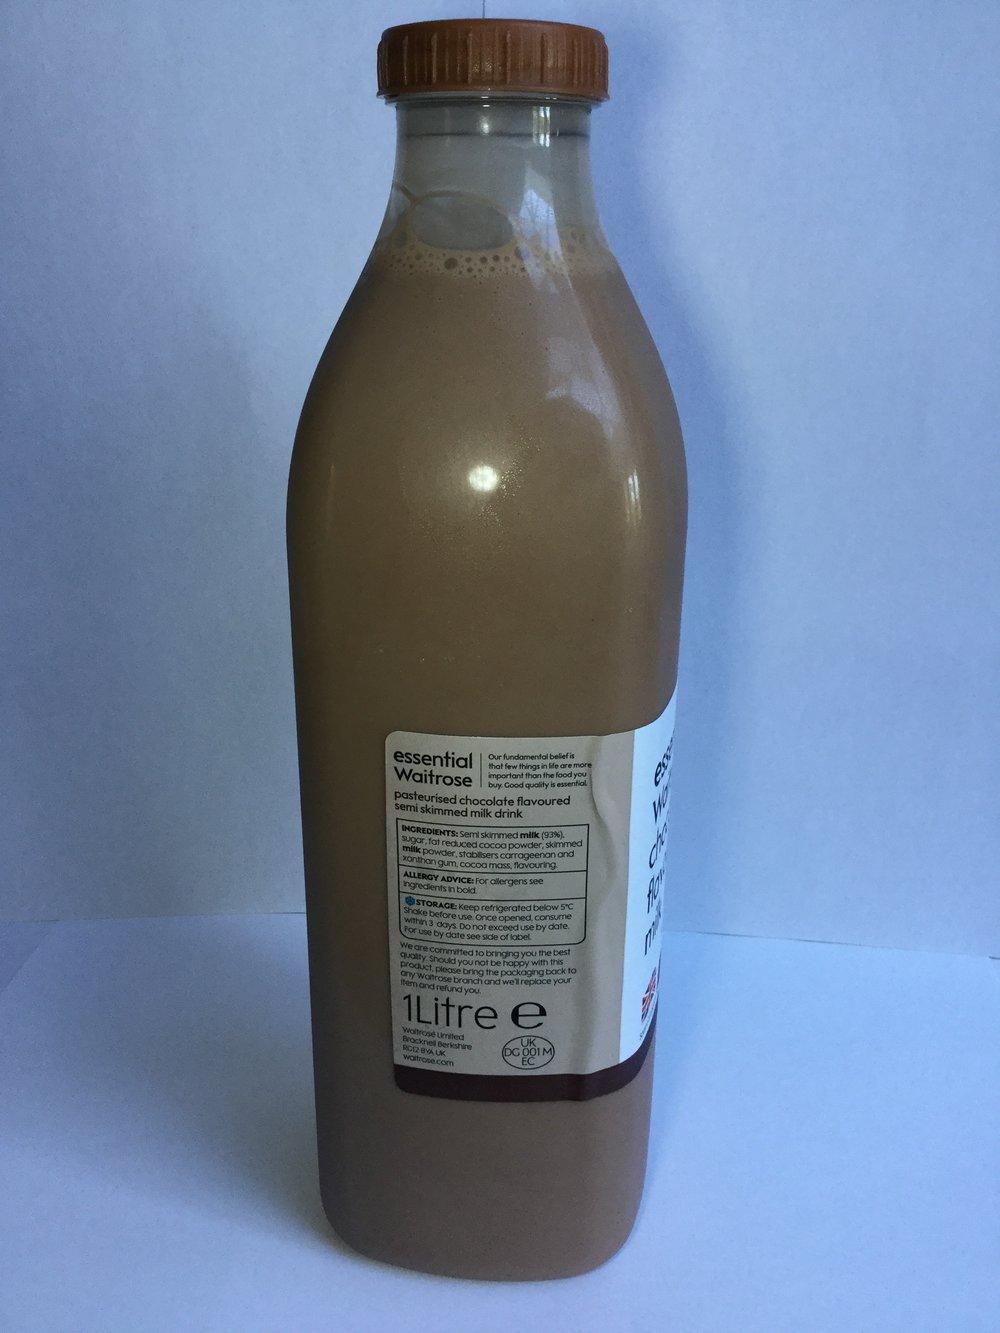 Waitrose Chocolate Flavoured Milk Side 2